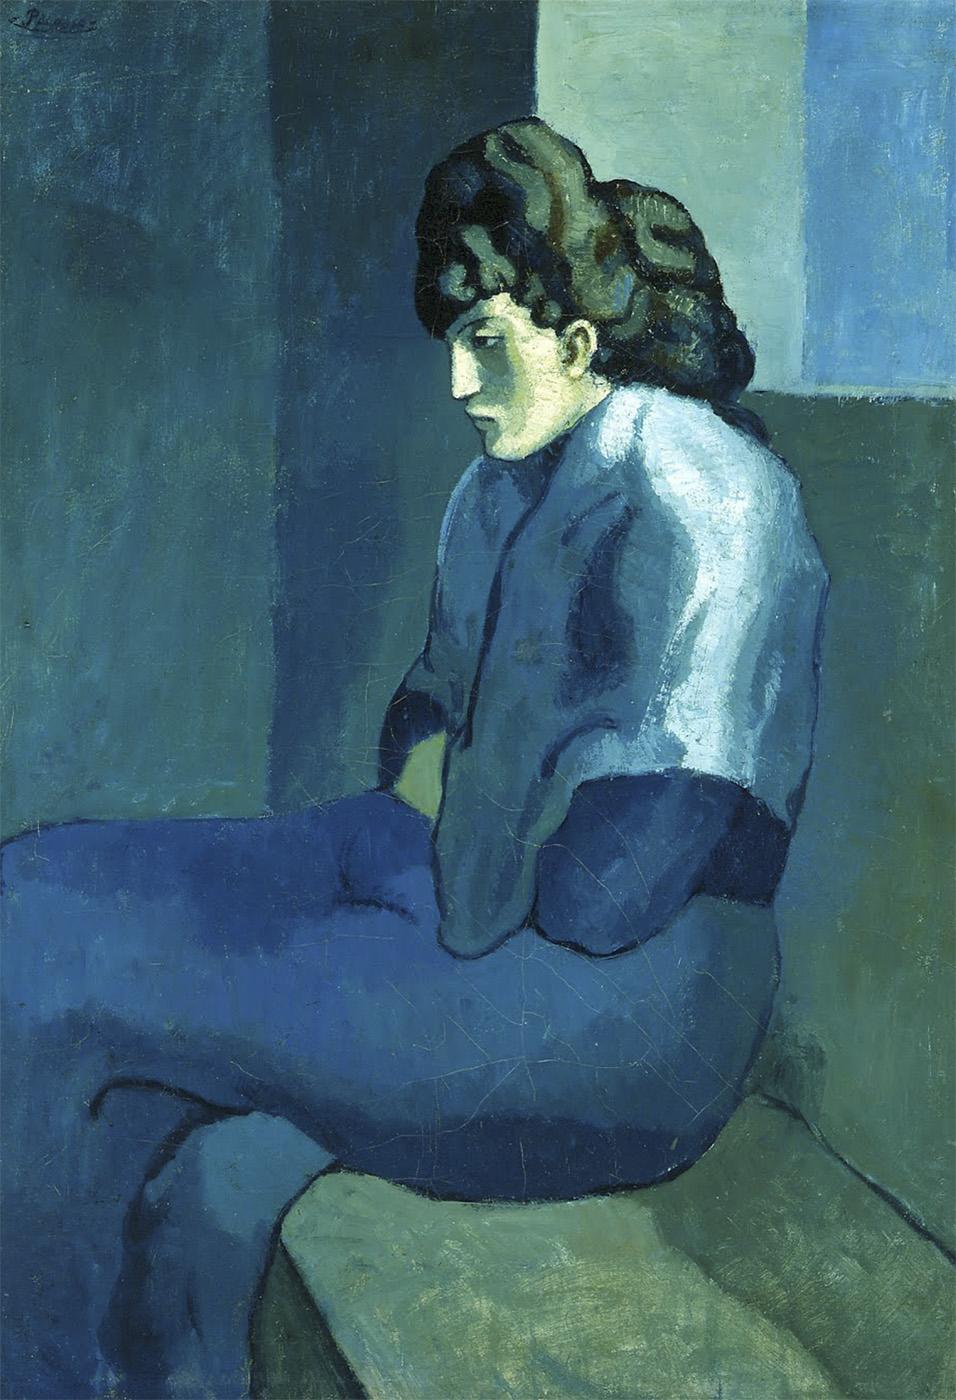 Pablo Picasso. Mujer melancólica. 1902. Detroit Institute of Arts. EEUU.